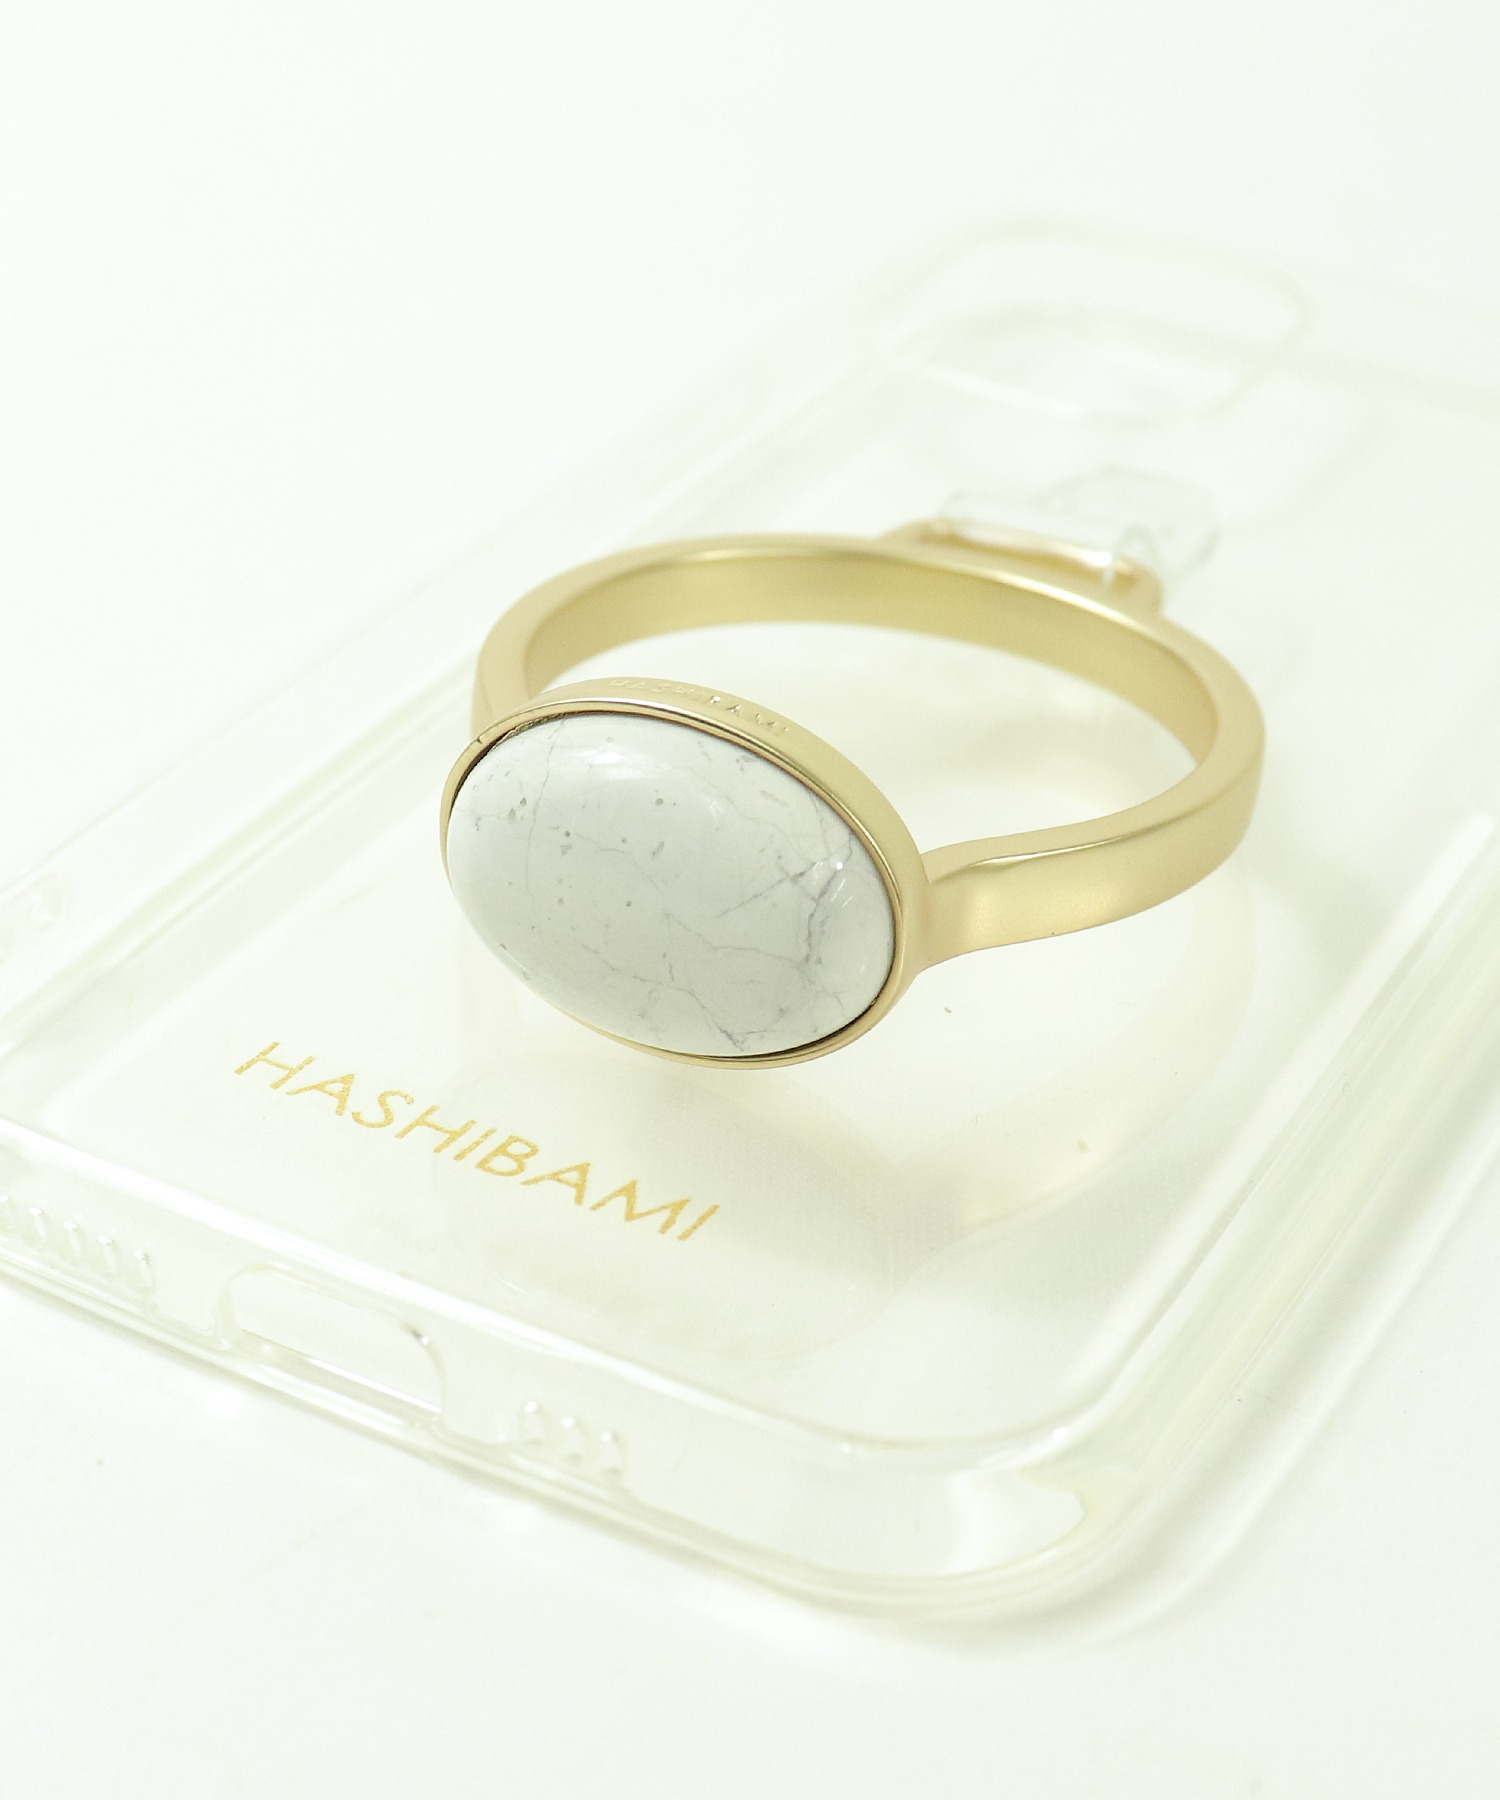 【 Hashibami / ハシバミ 】別注 iPhone12/12pro クリア スマホ・携帯カバー 天然石リング付きケース